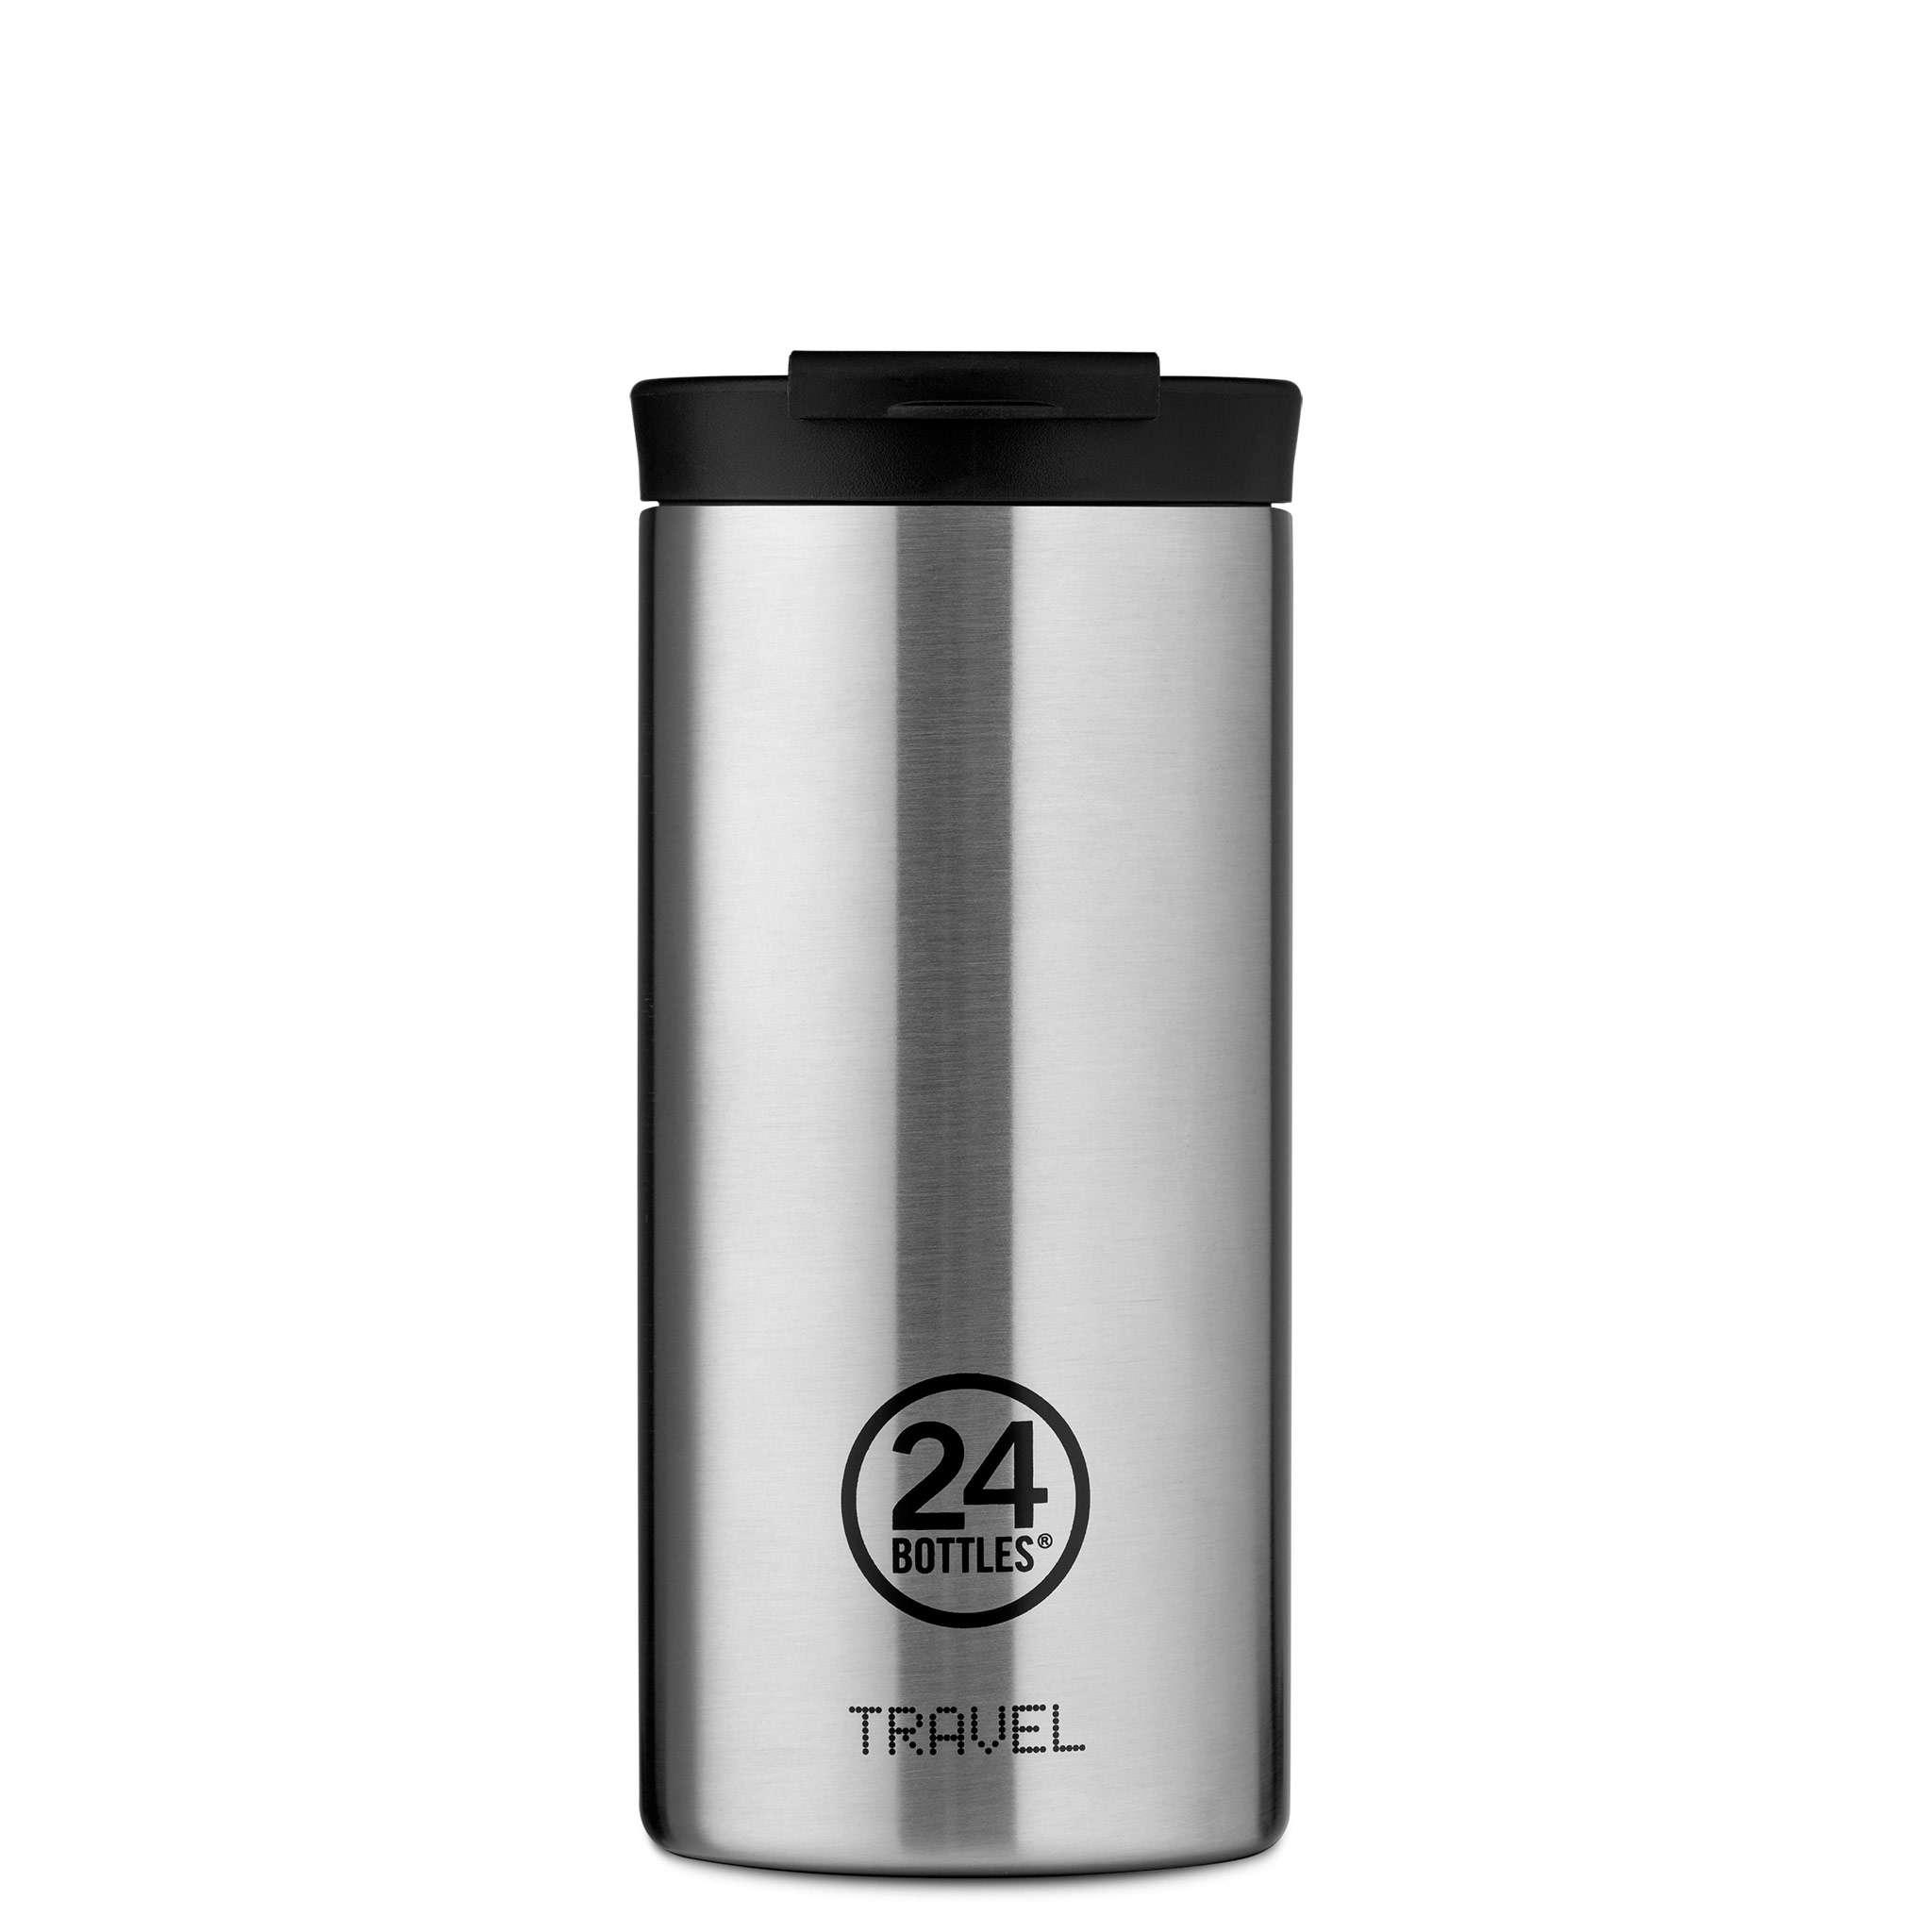 Tumbler 600ml Stainless Steel